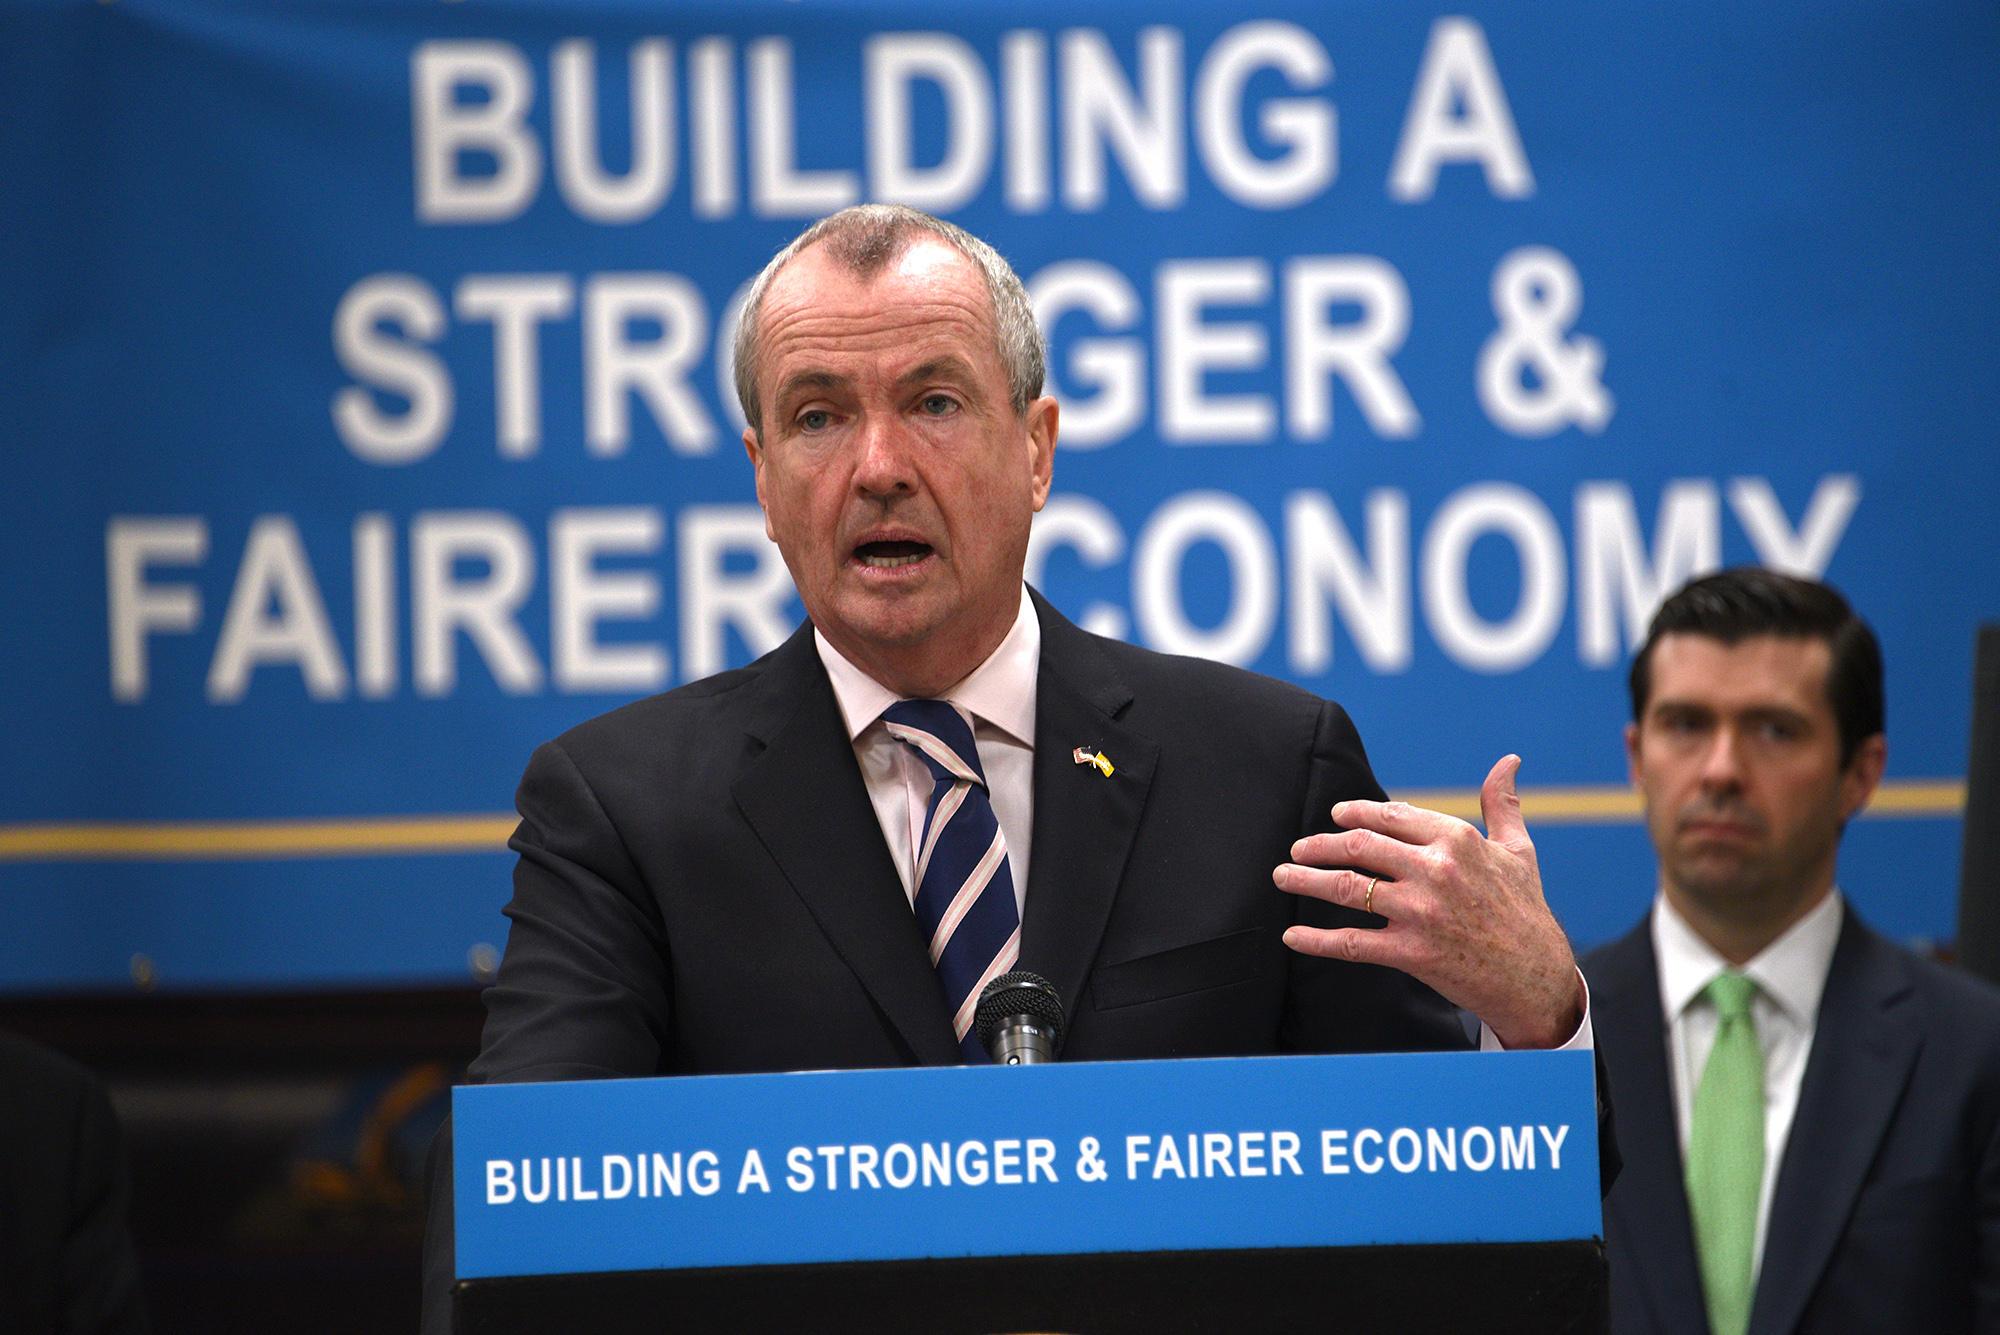 NJ Senate to vote on workaround of federal tax overhaul